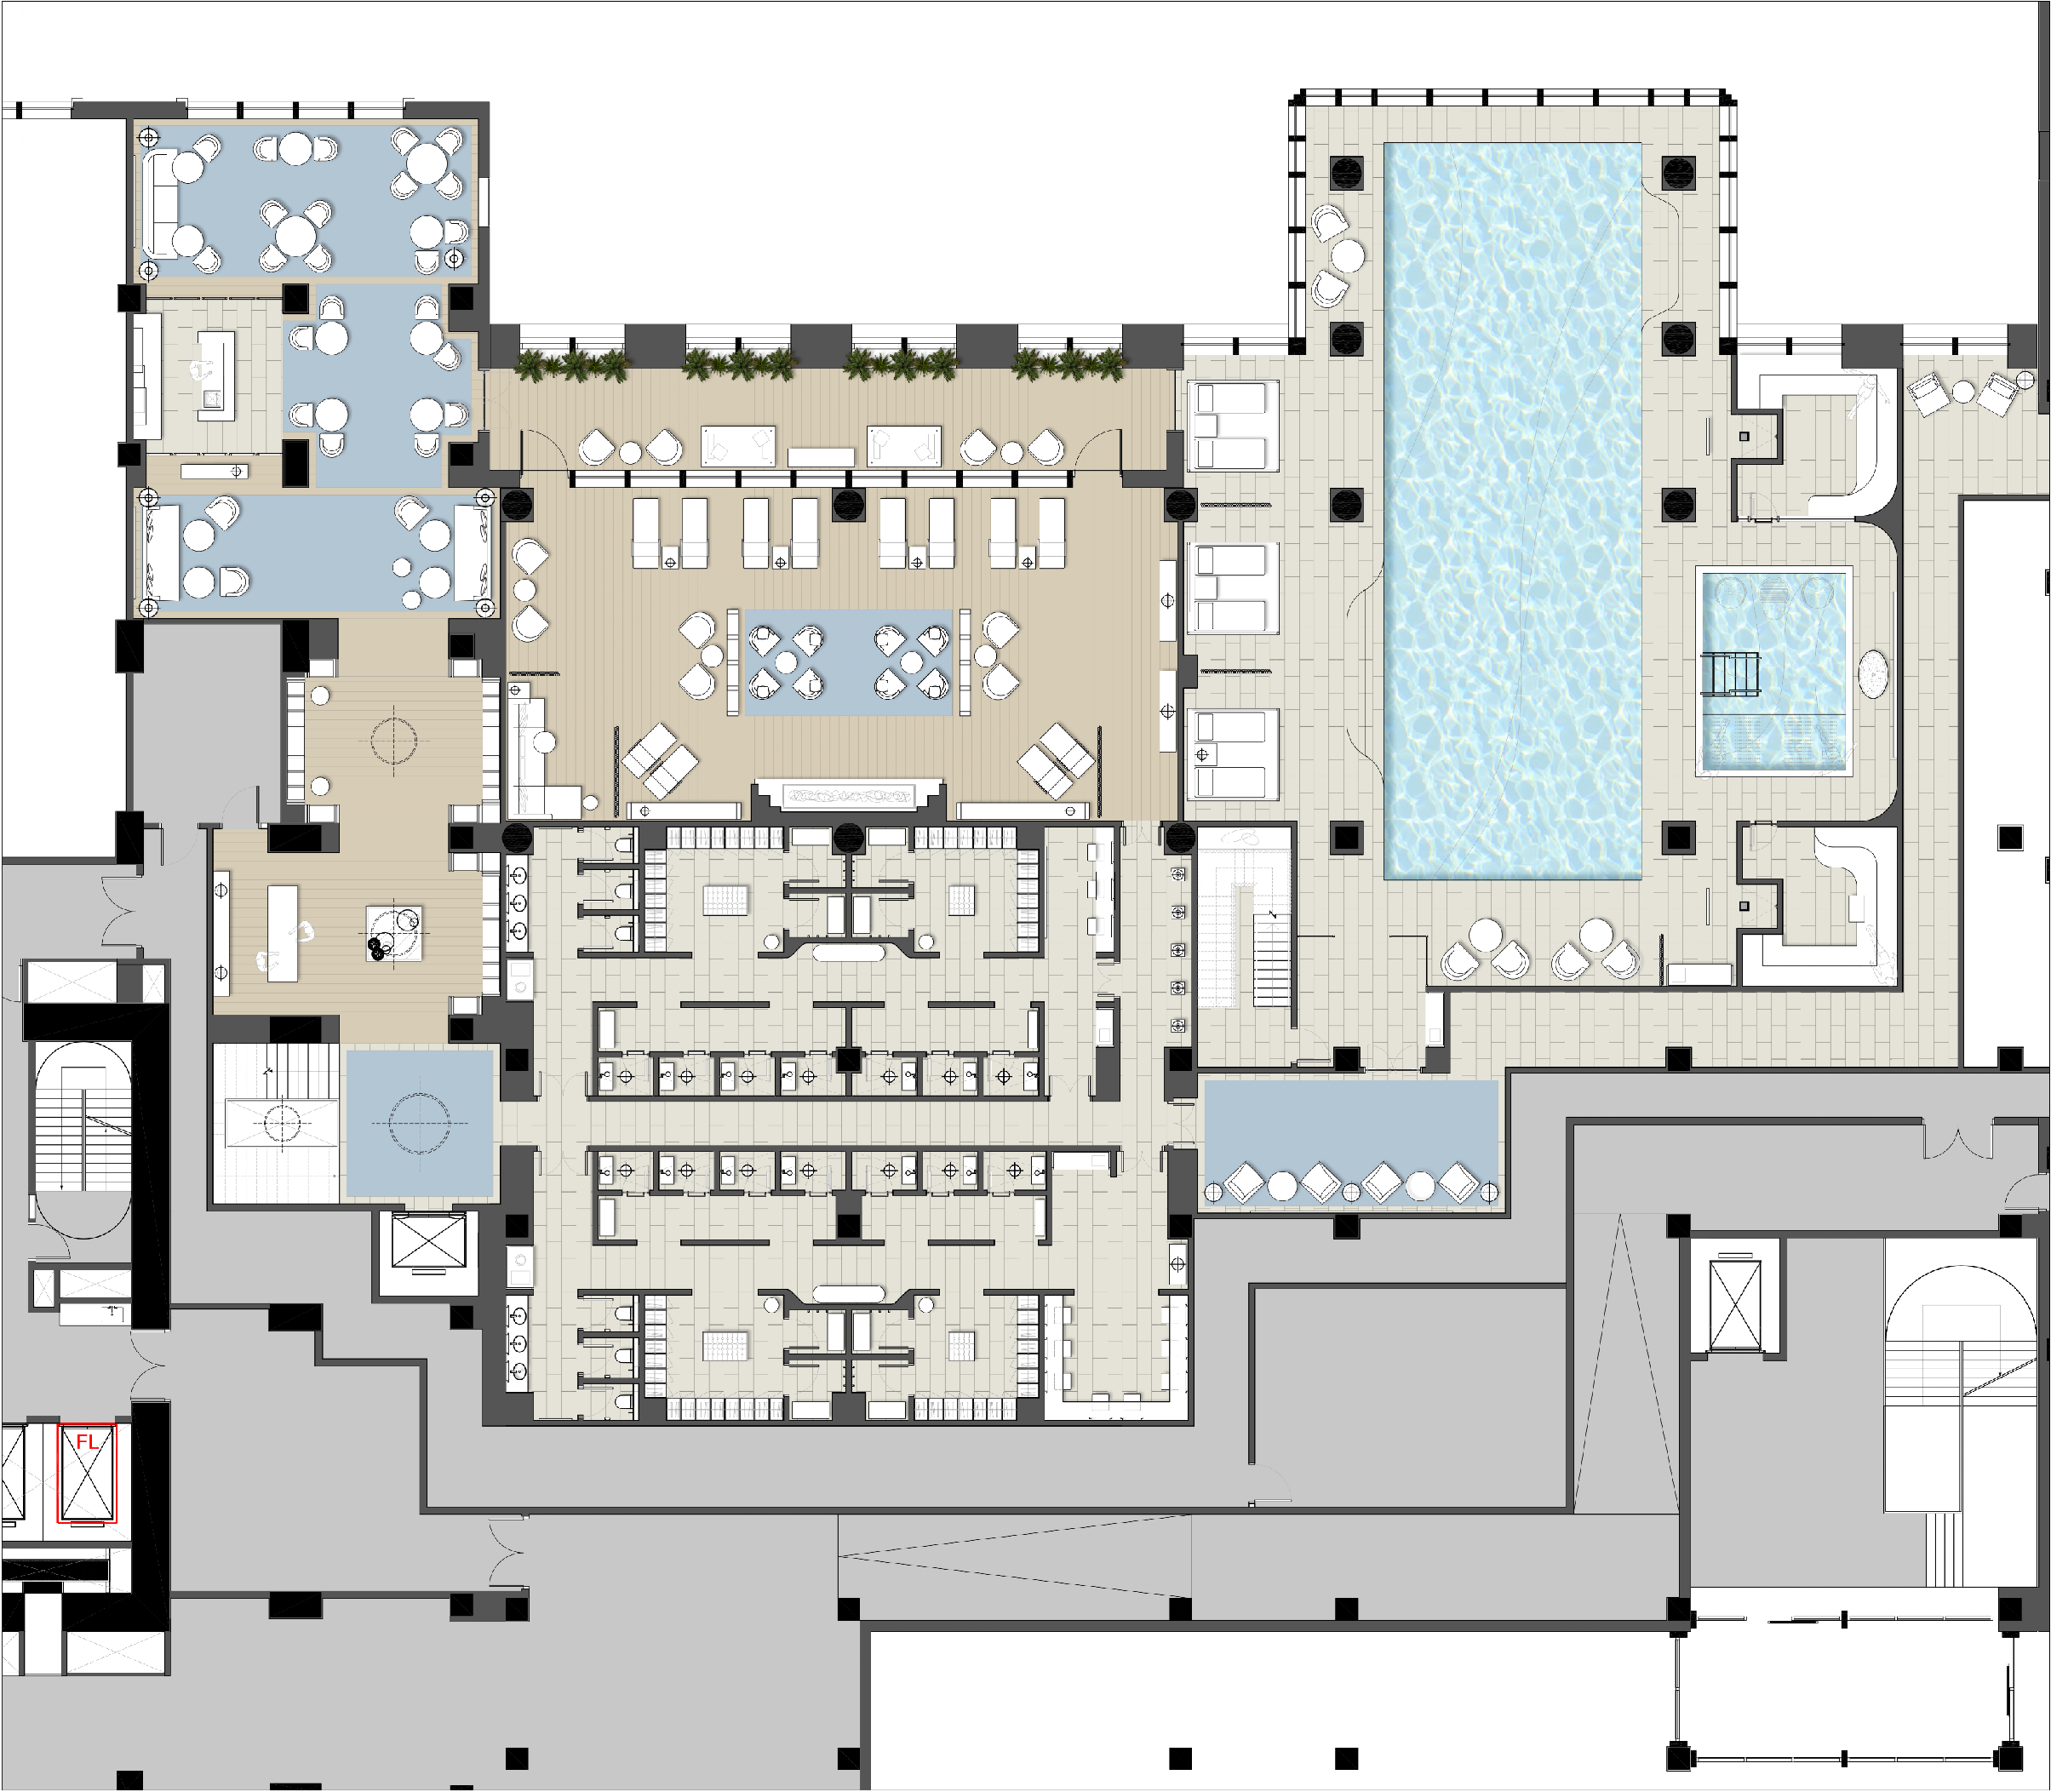 Architectural Designer At Ga Design International Hotel Plan Building Layout Office Floor Plan